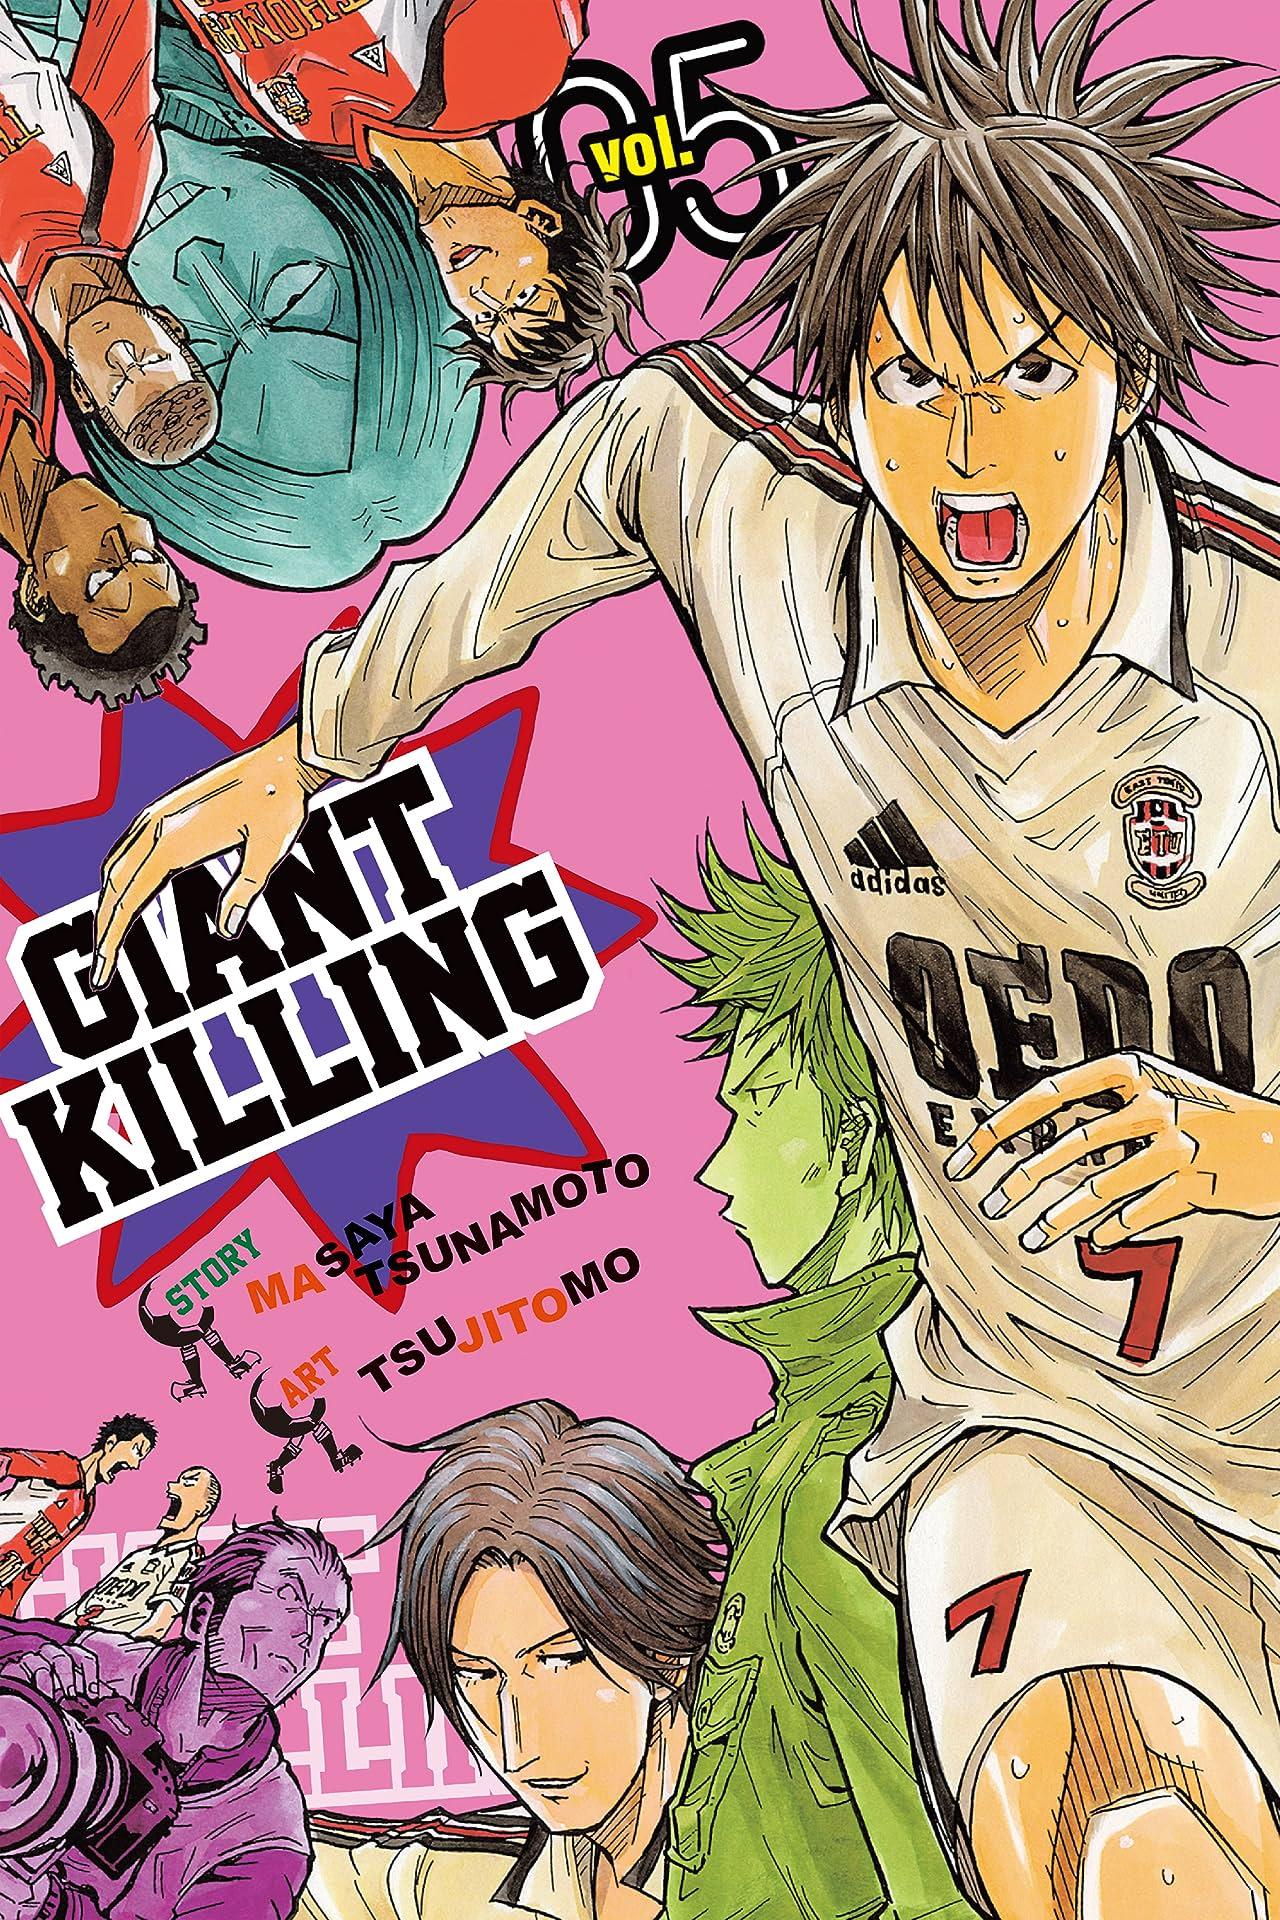 Giant Killing Vol. 5